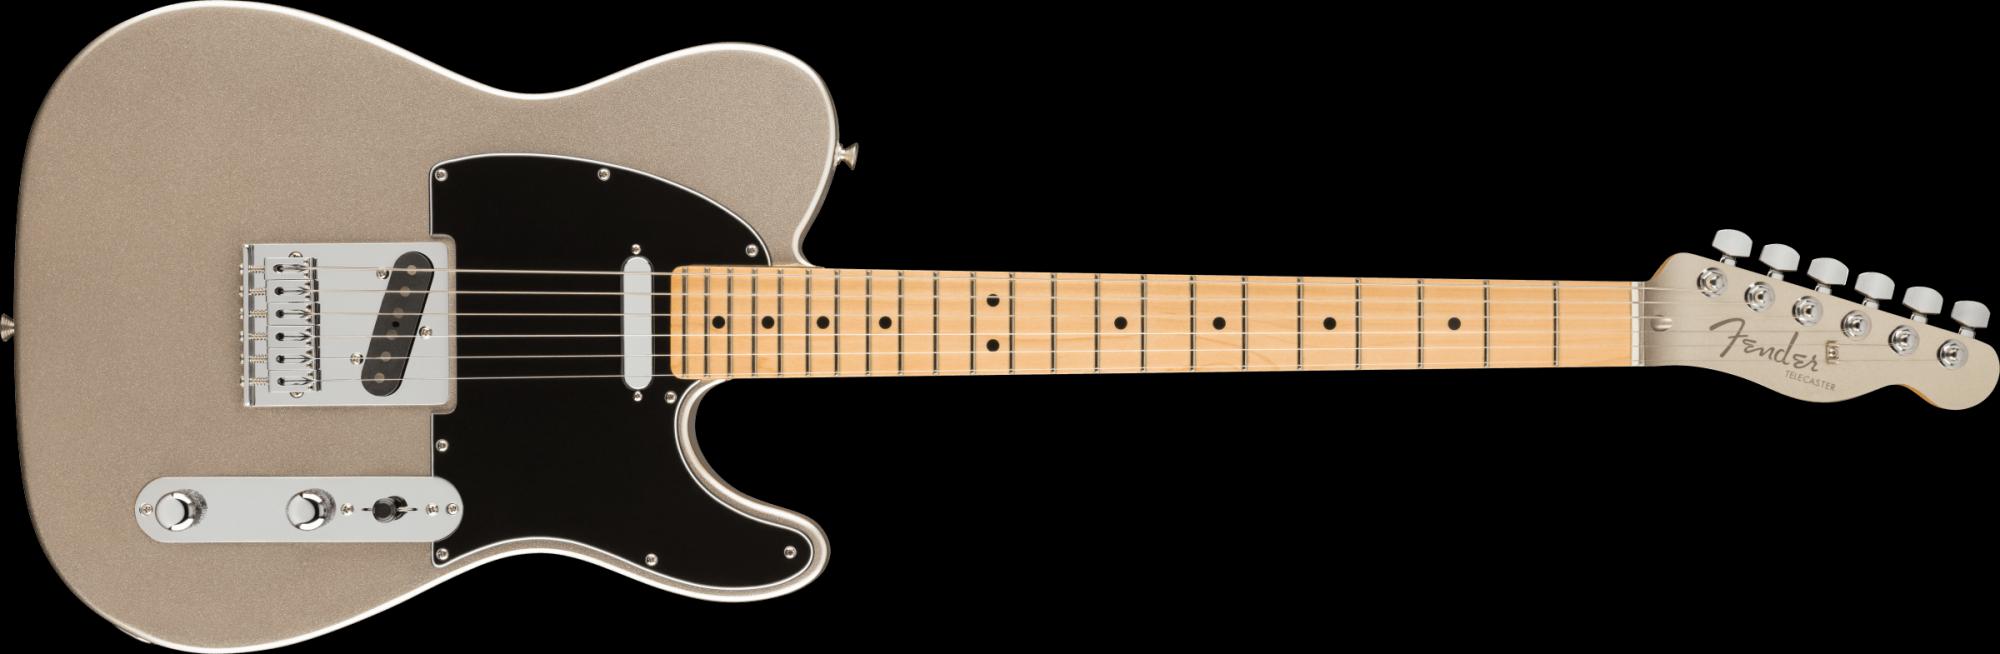 Fender 75th Anniversary Edition Telecaster w/ gig bag